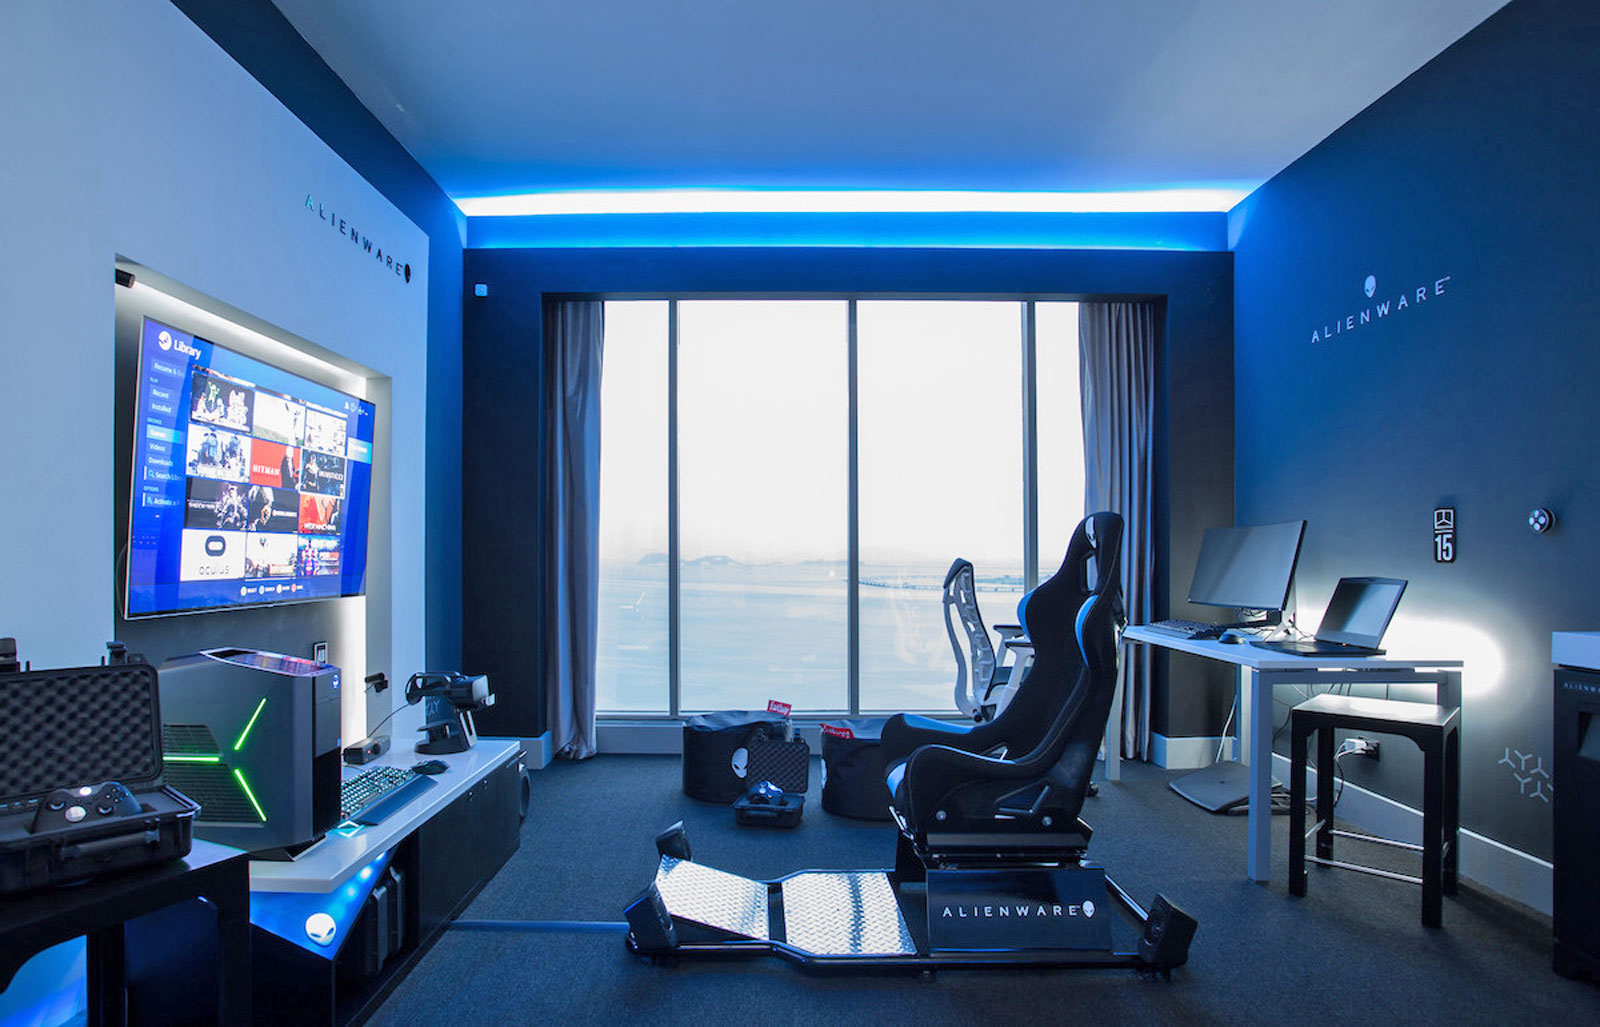 Alienware 與希爾頓集團在巴拿馬市的 Hilton Panama 裡,設置了一間電競主題的套房 Room 2425,裡面放置了 Alienware 的電競 PC 和配件、Oculus Rift VR 裝置,以及 Xbox One Elite 手把。